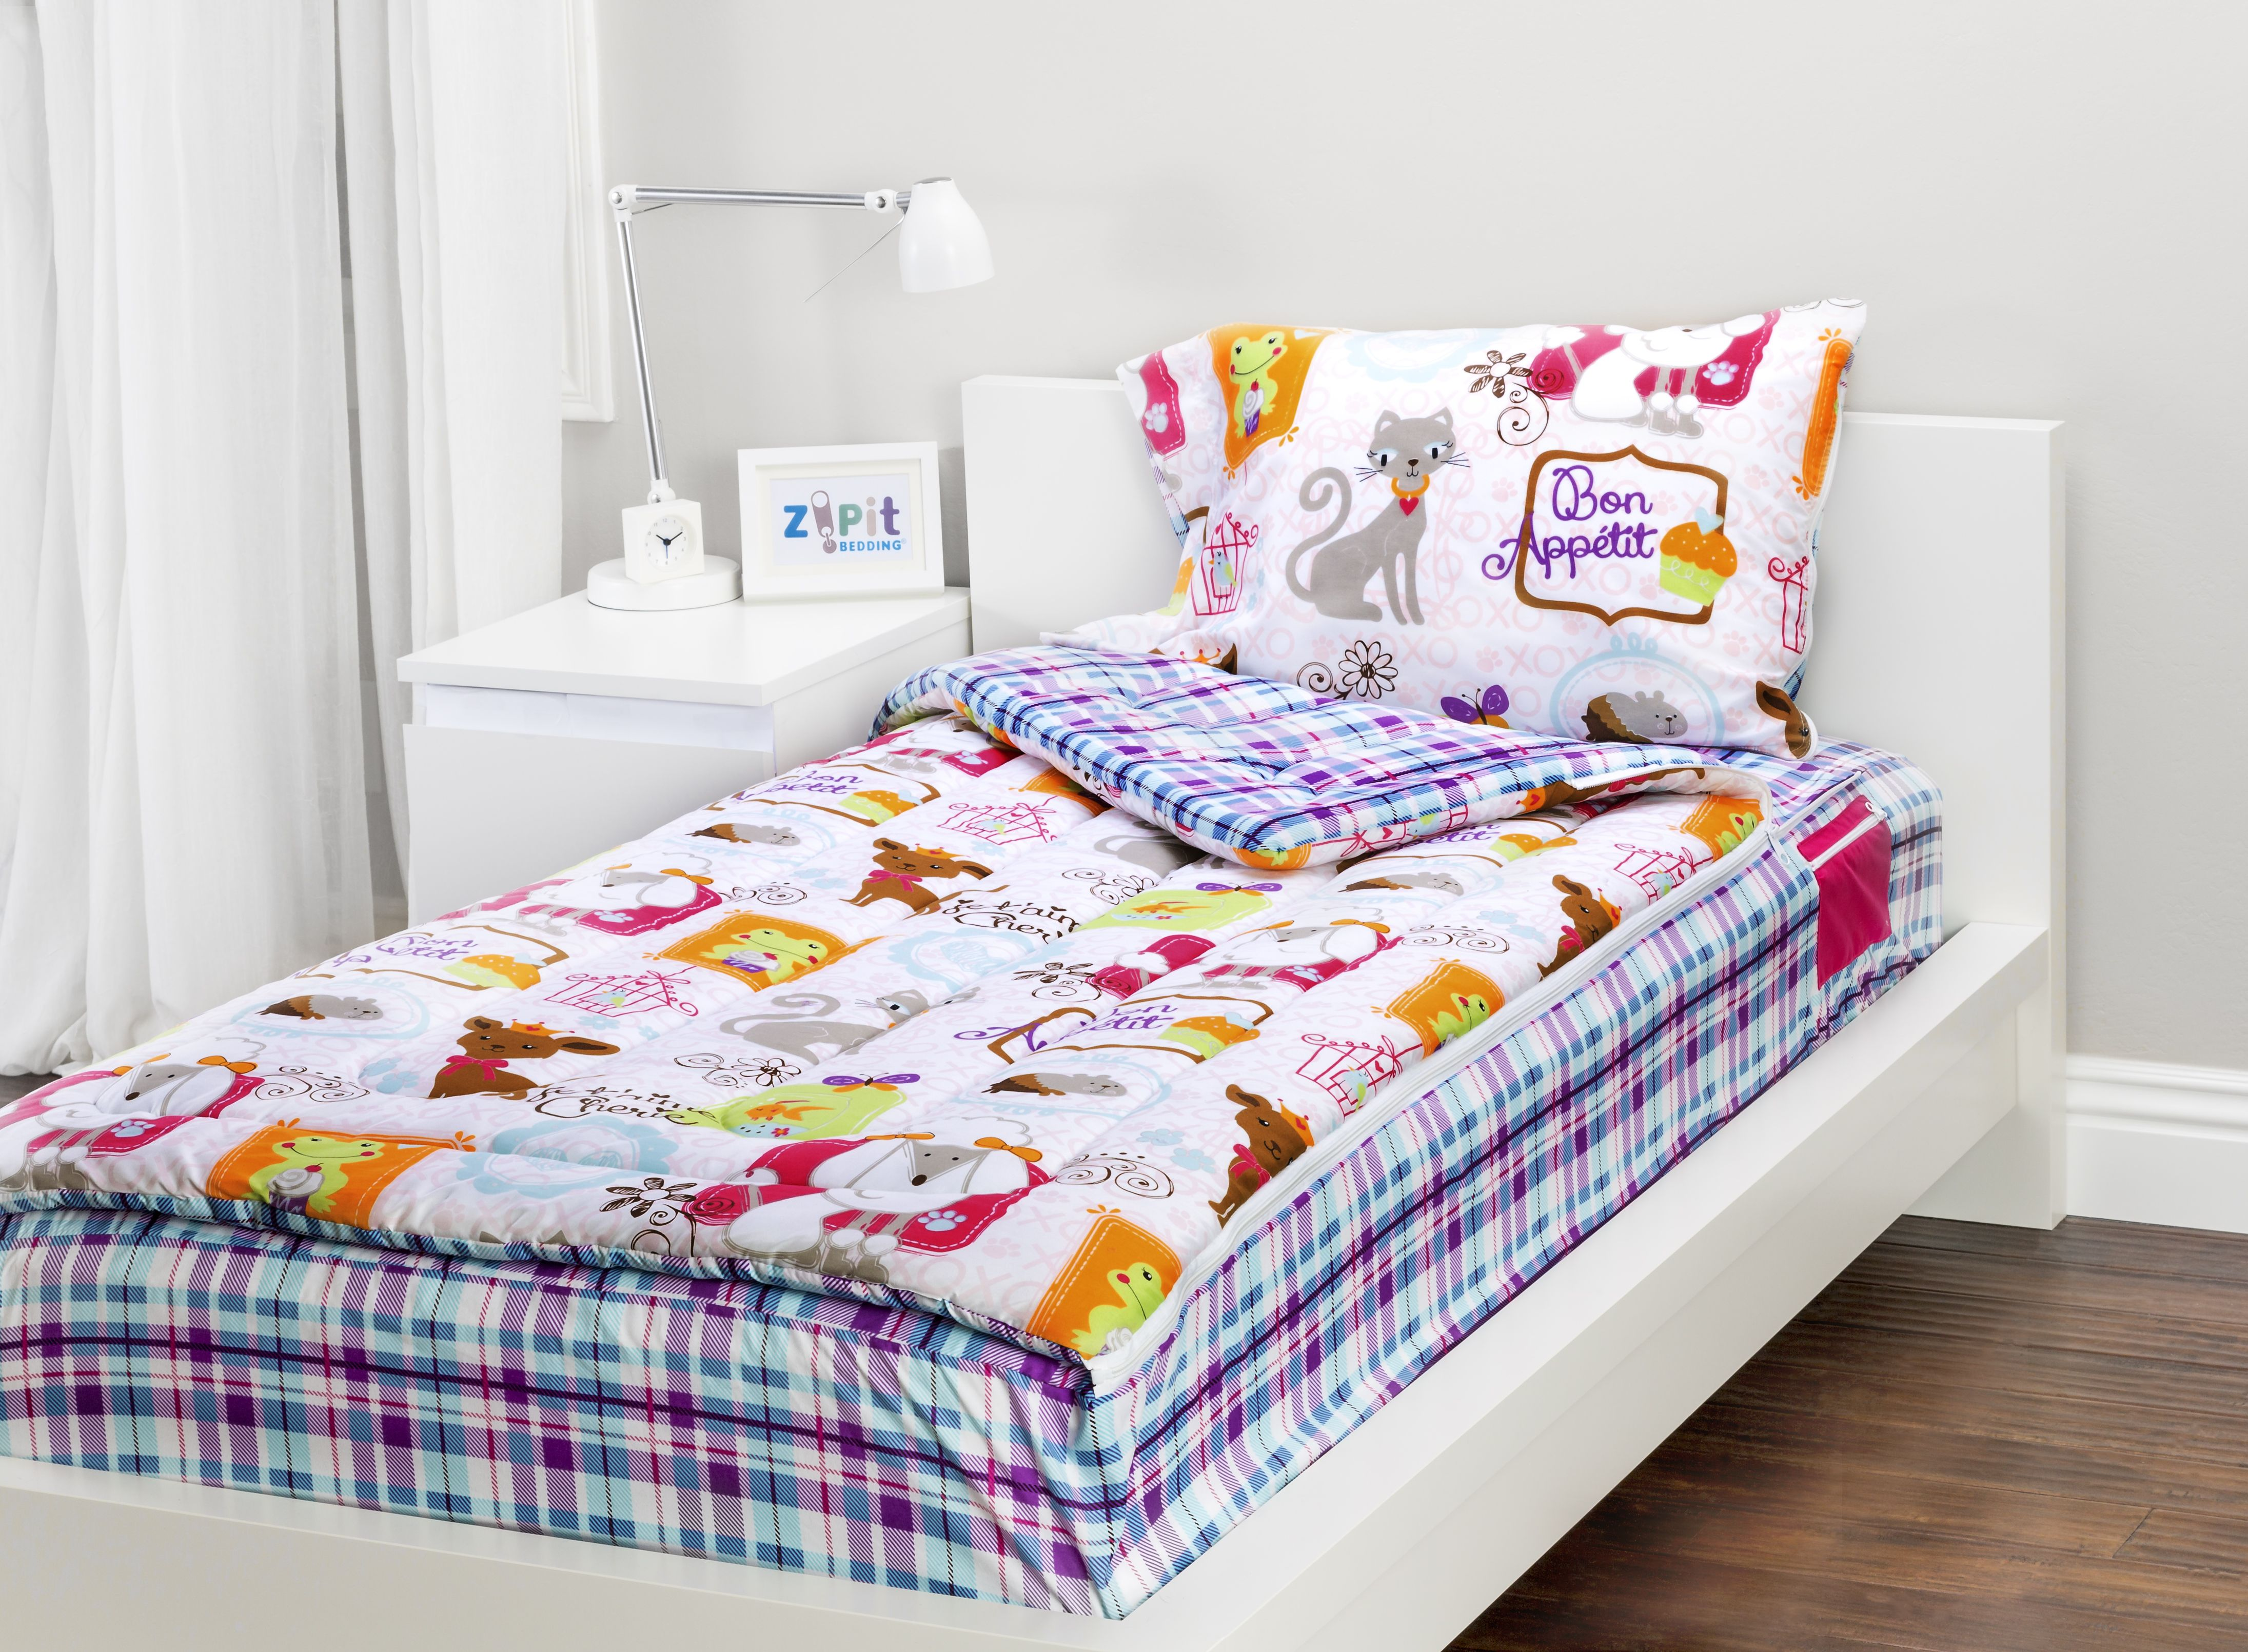 Sweet Stuff Zipit Bedding Set. Zipit Bedding is America's